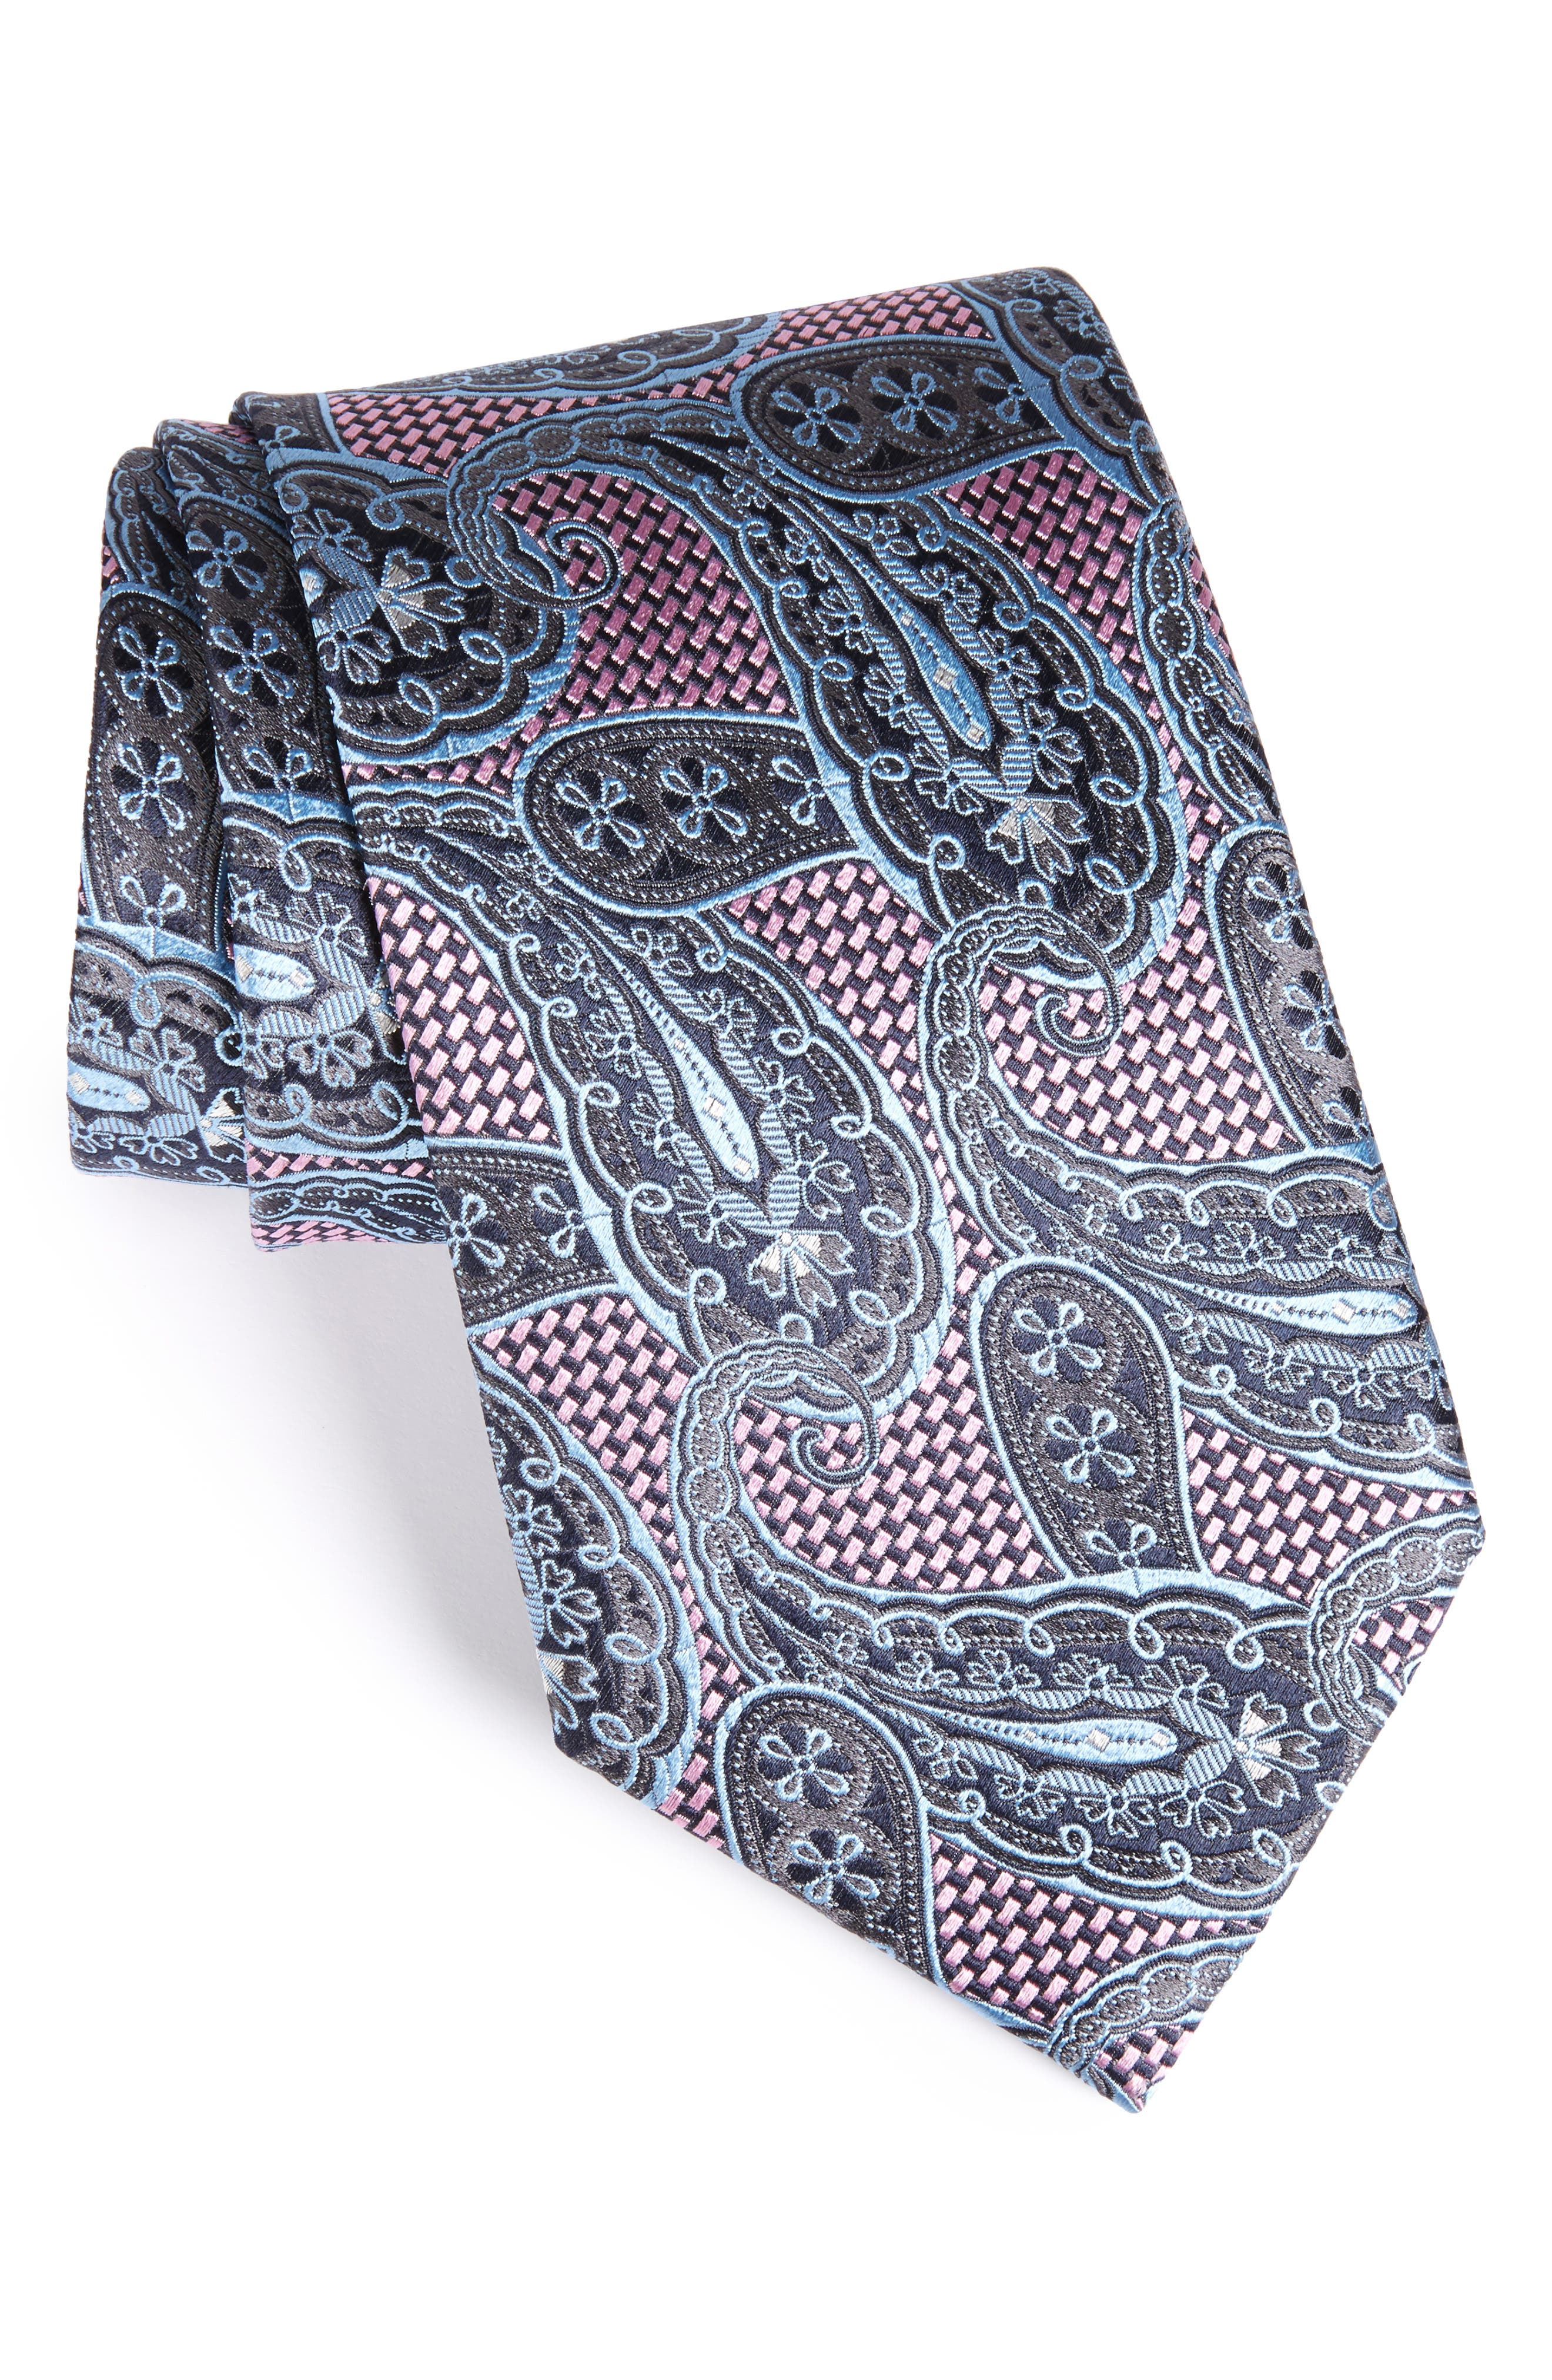 Alternate Image 1 Selected - Ermenegildo Zegna Paisley Silk Tie (X-Long)